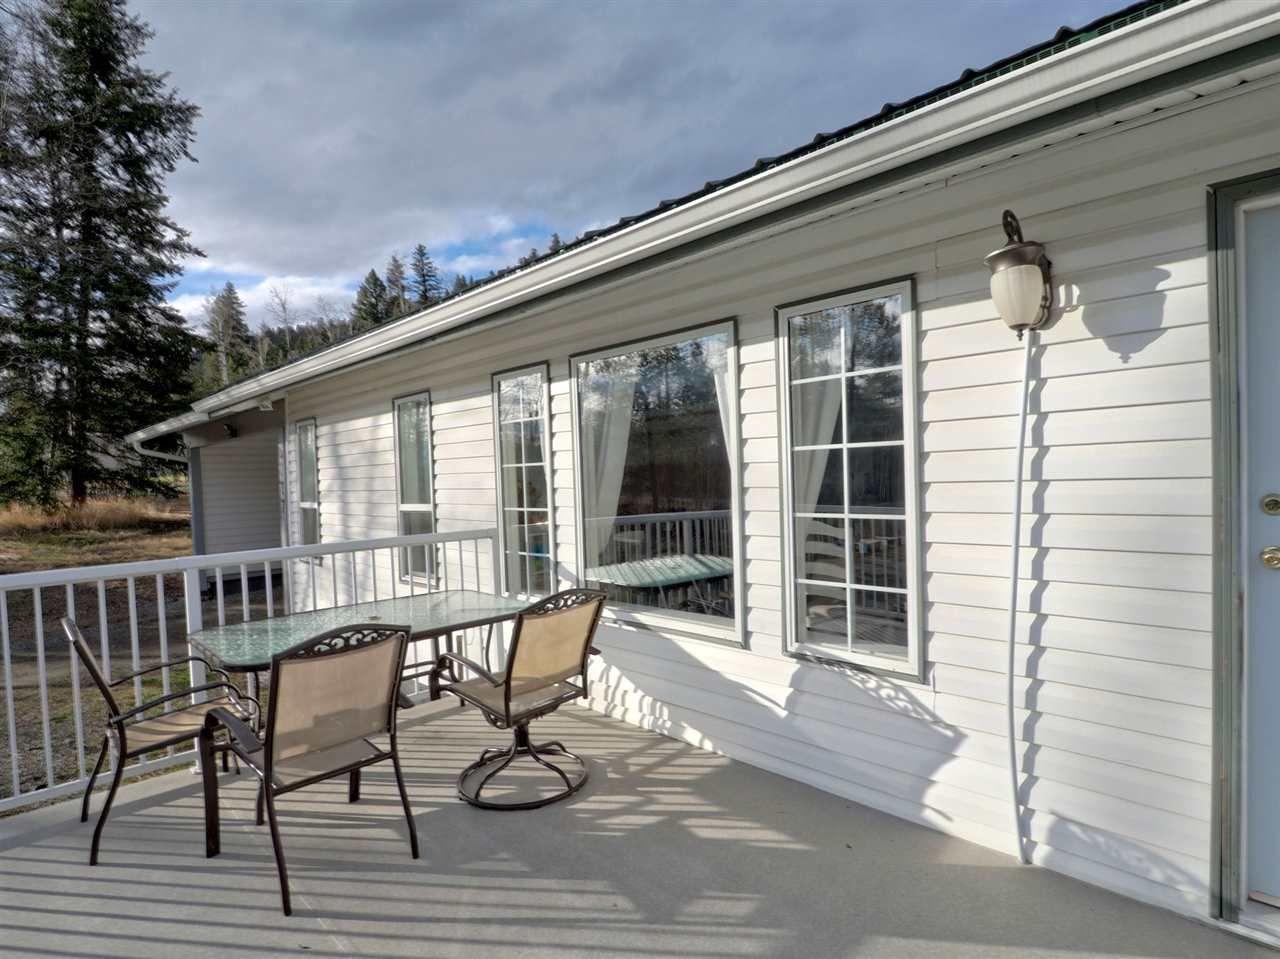 Main Photo: 5777 HORSE LAKE Road: Horse Lake House for sale (100 Mile House (Zone 10))  : MLS®# R2451350